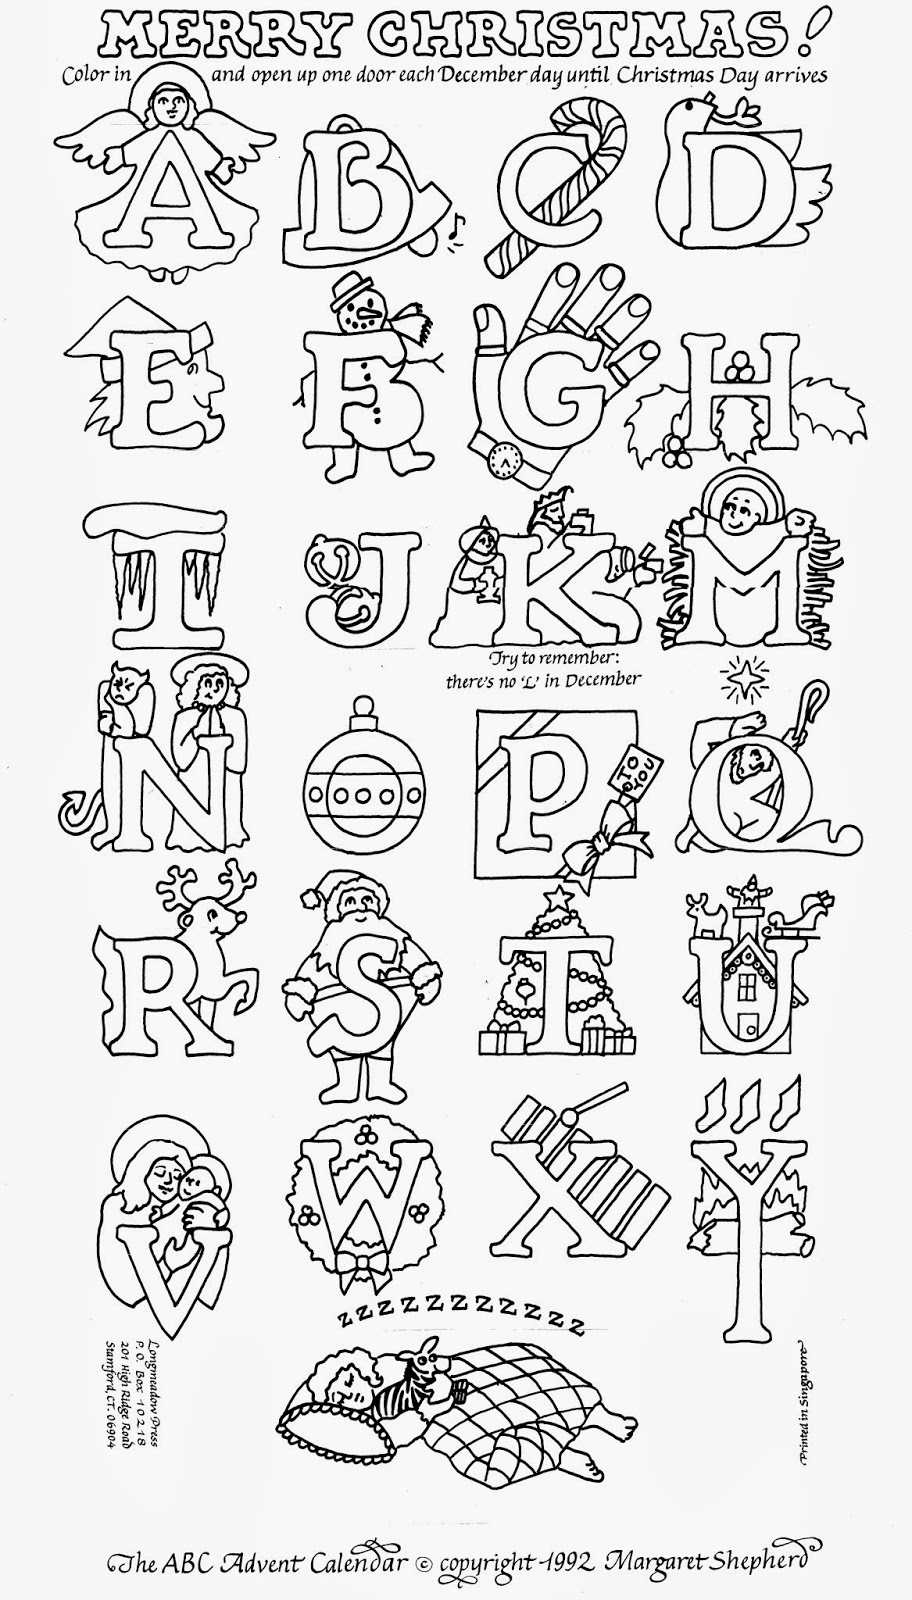 abc catholic coloring pages - photo#22